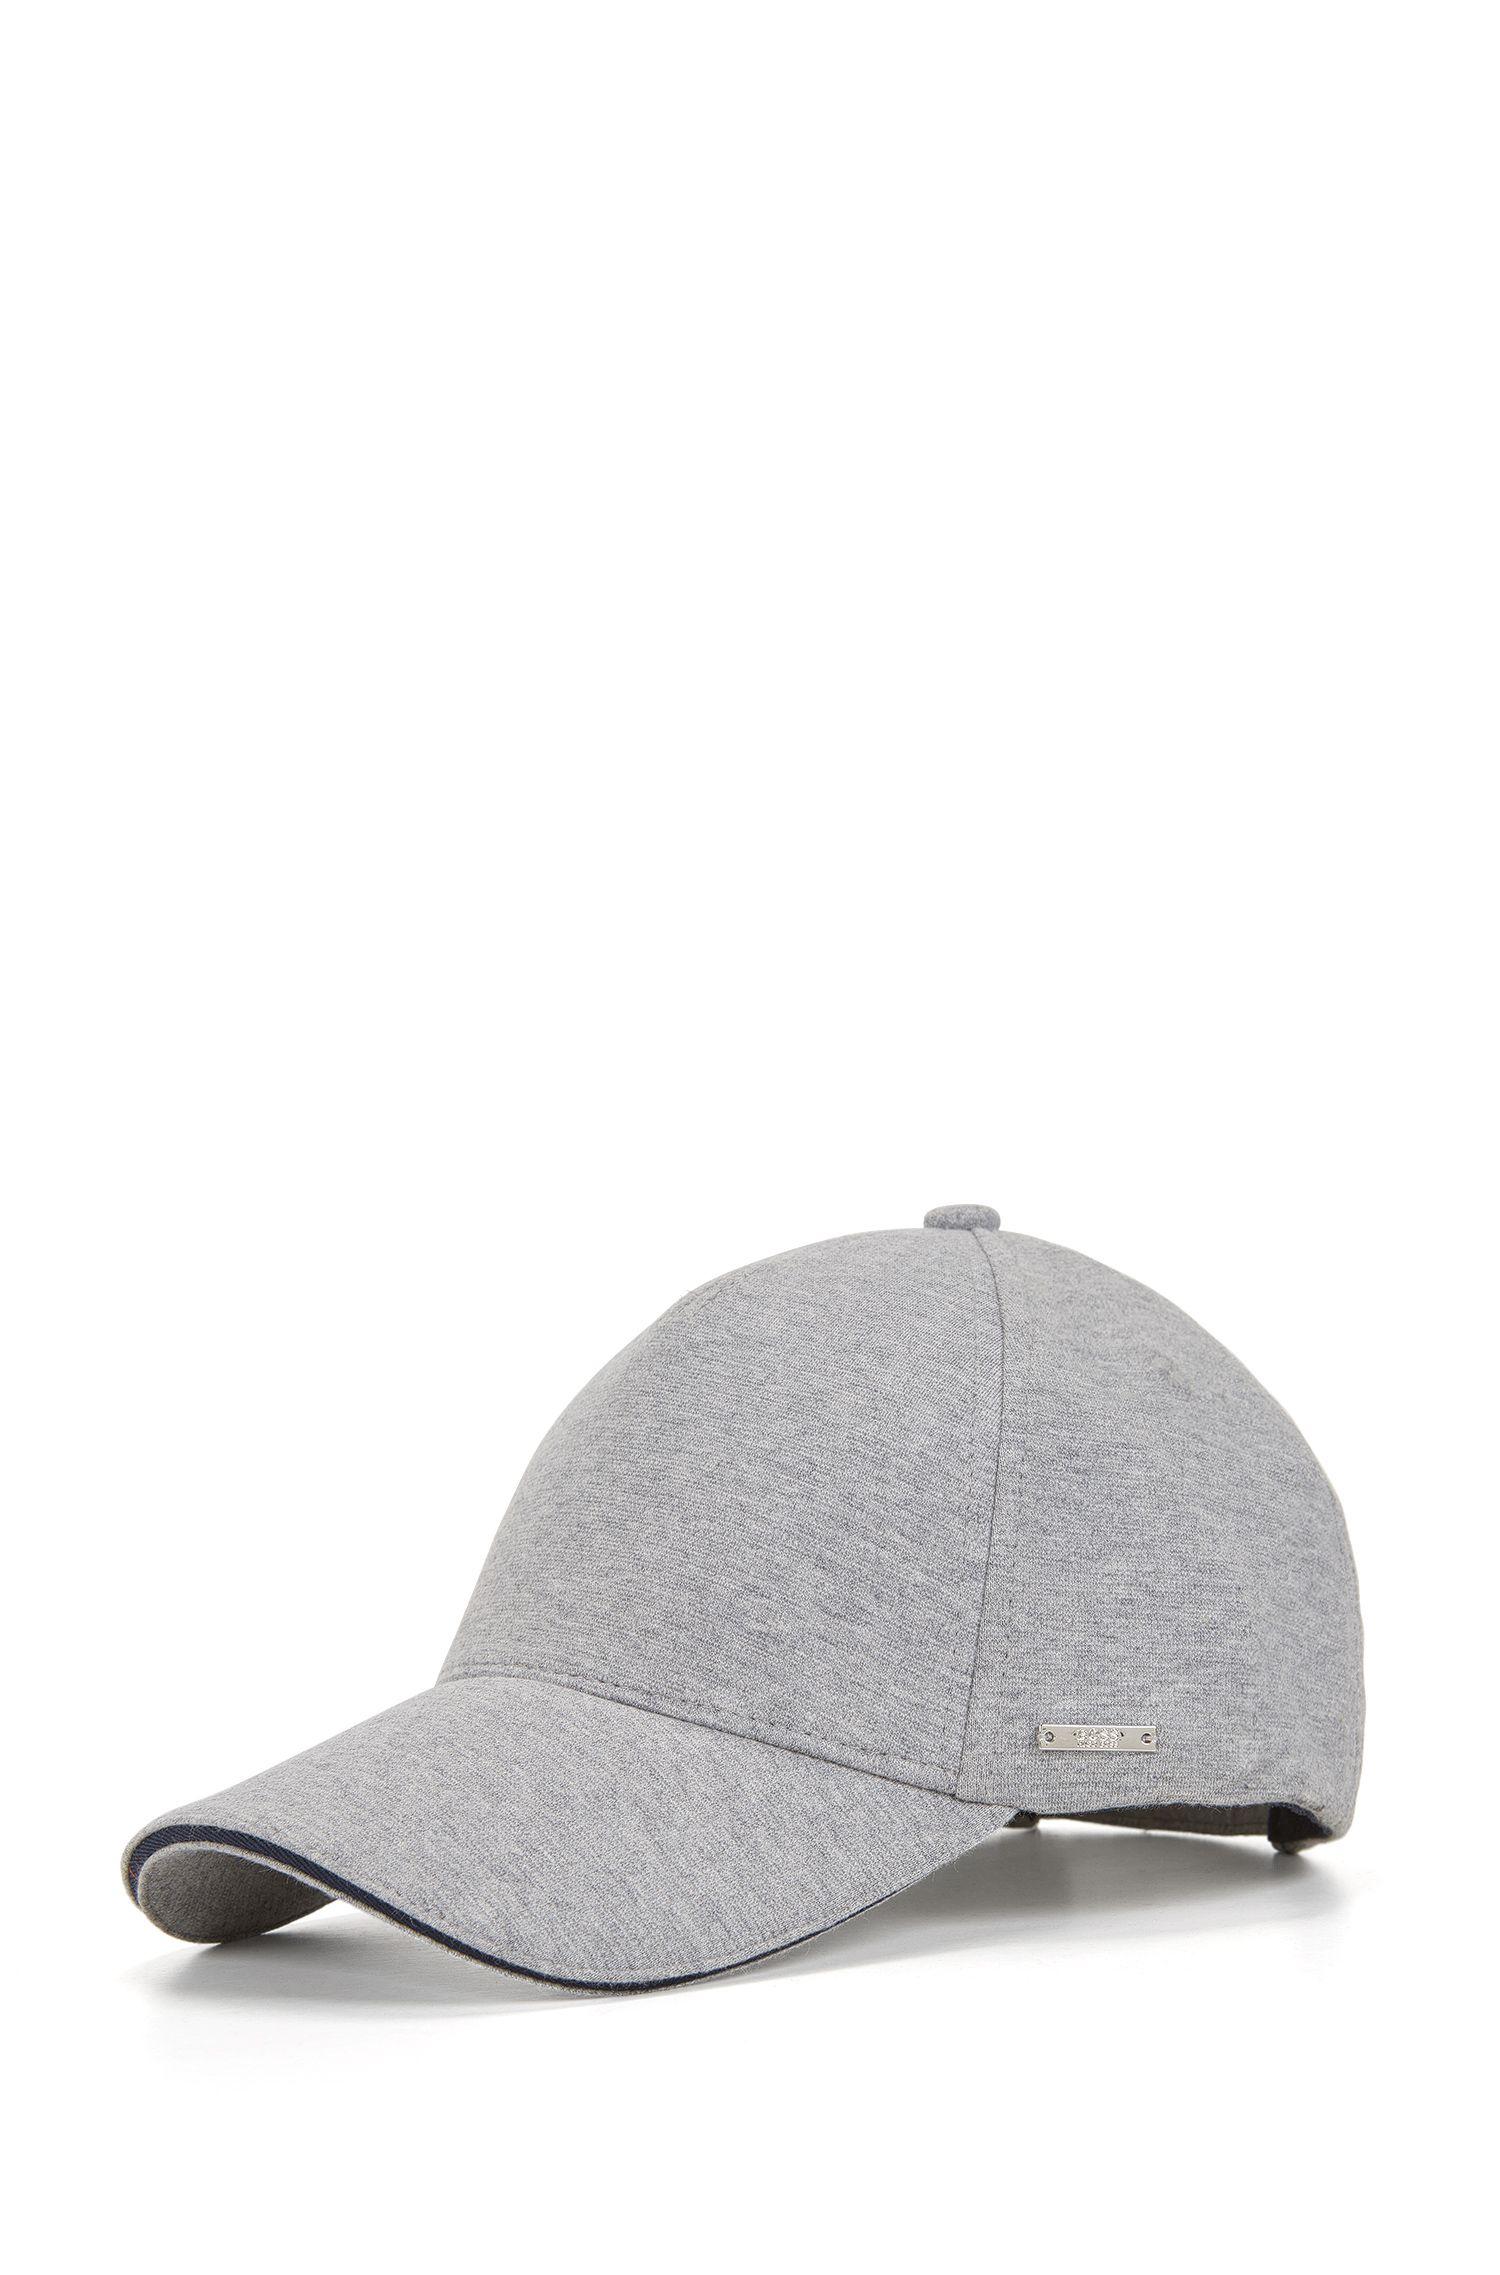 Cotton Blend Twill Cap | Serios